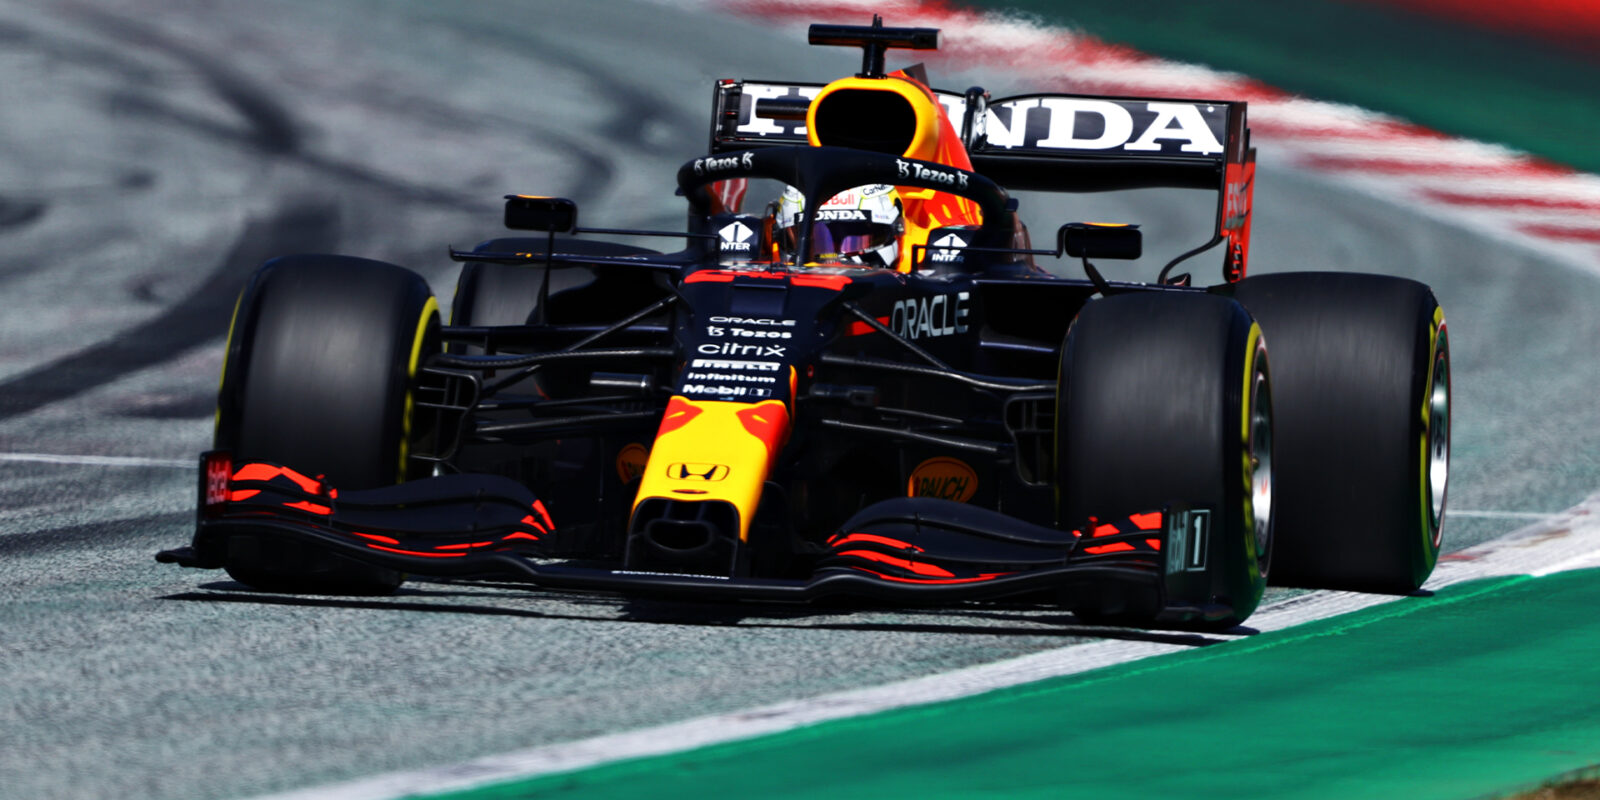 Kvalifikaci v Rakousku ovládl Verstappen, Russell v Q3